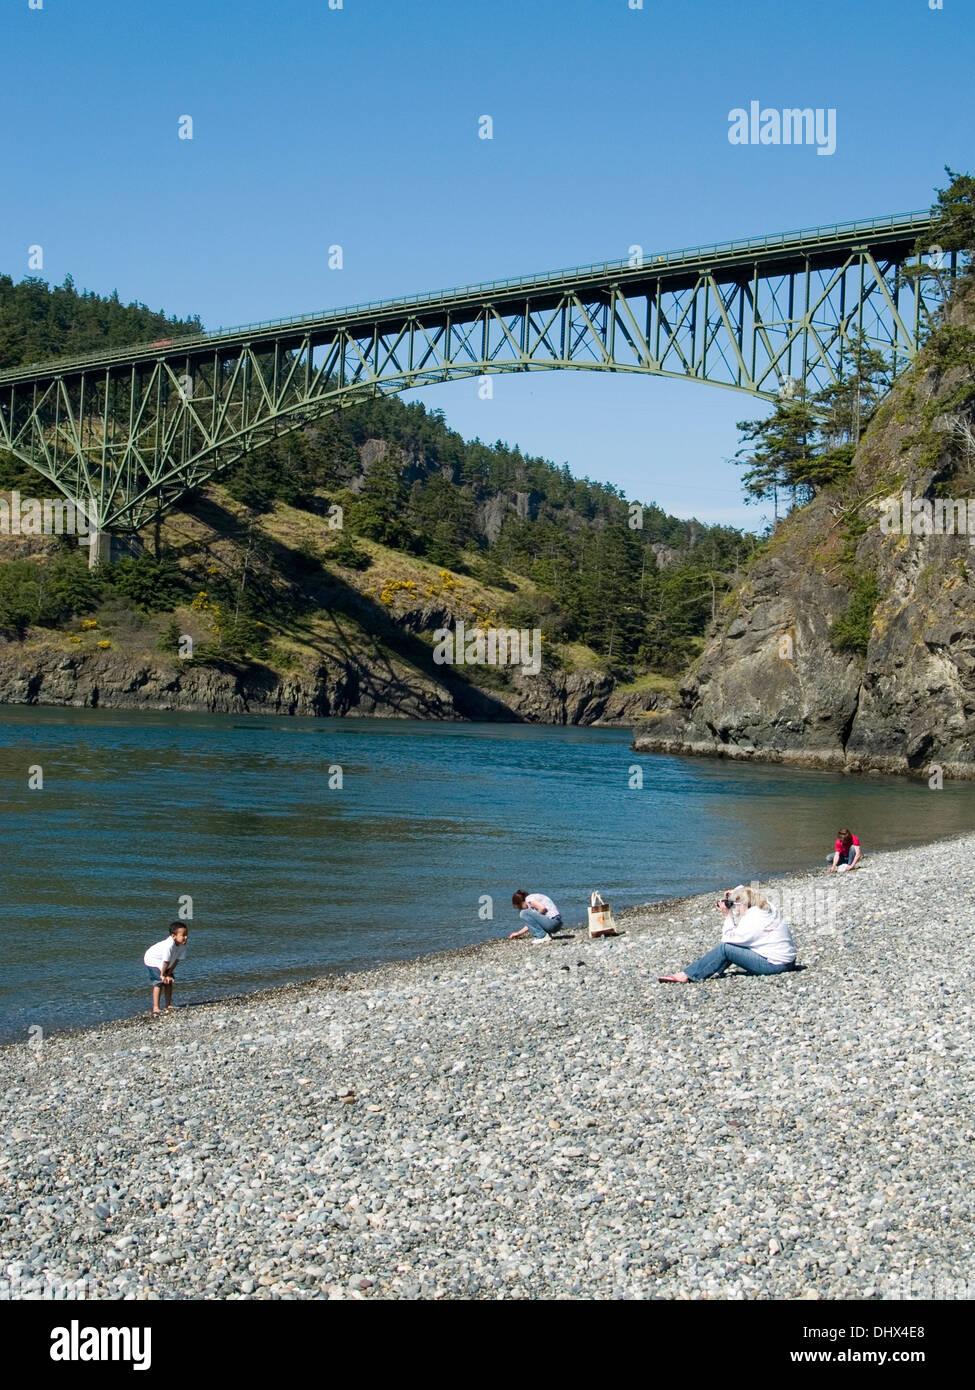 Deception Pass Bridge,Washington State - Stock Image